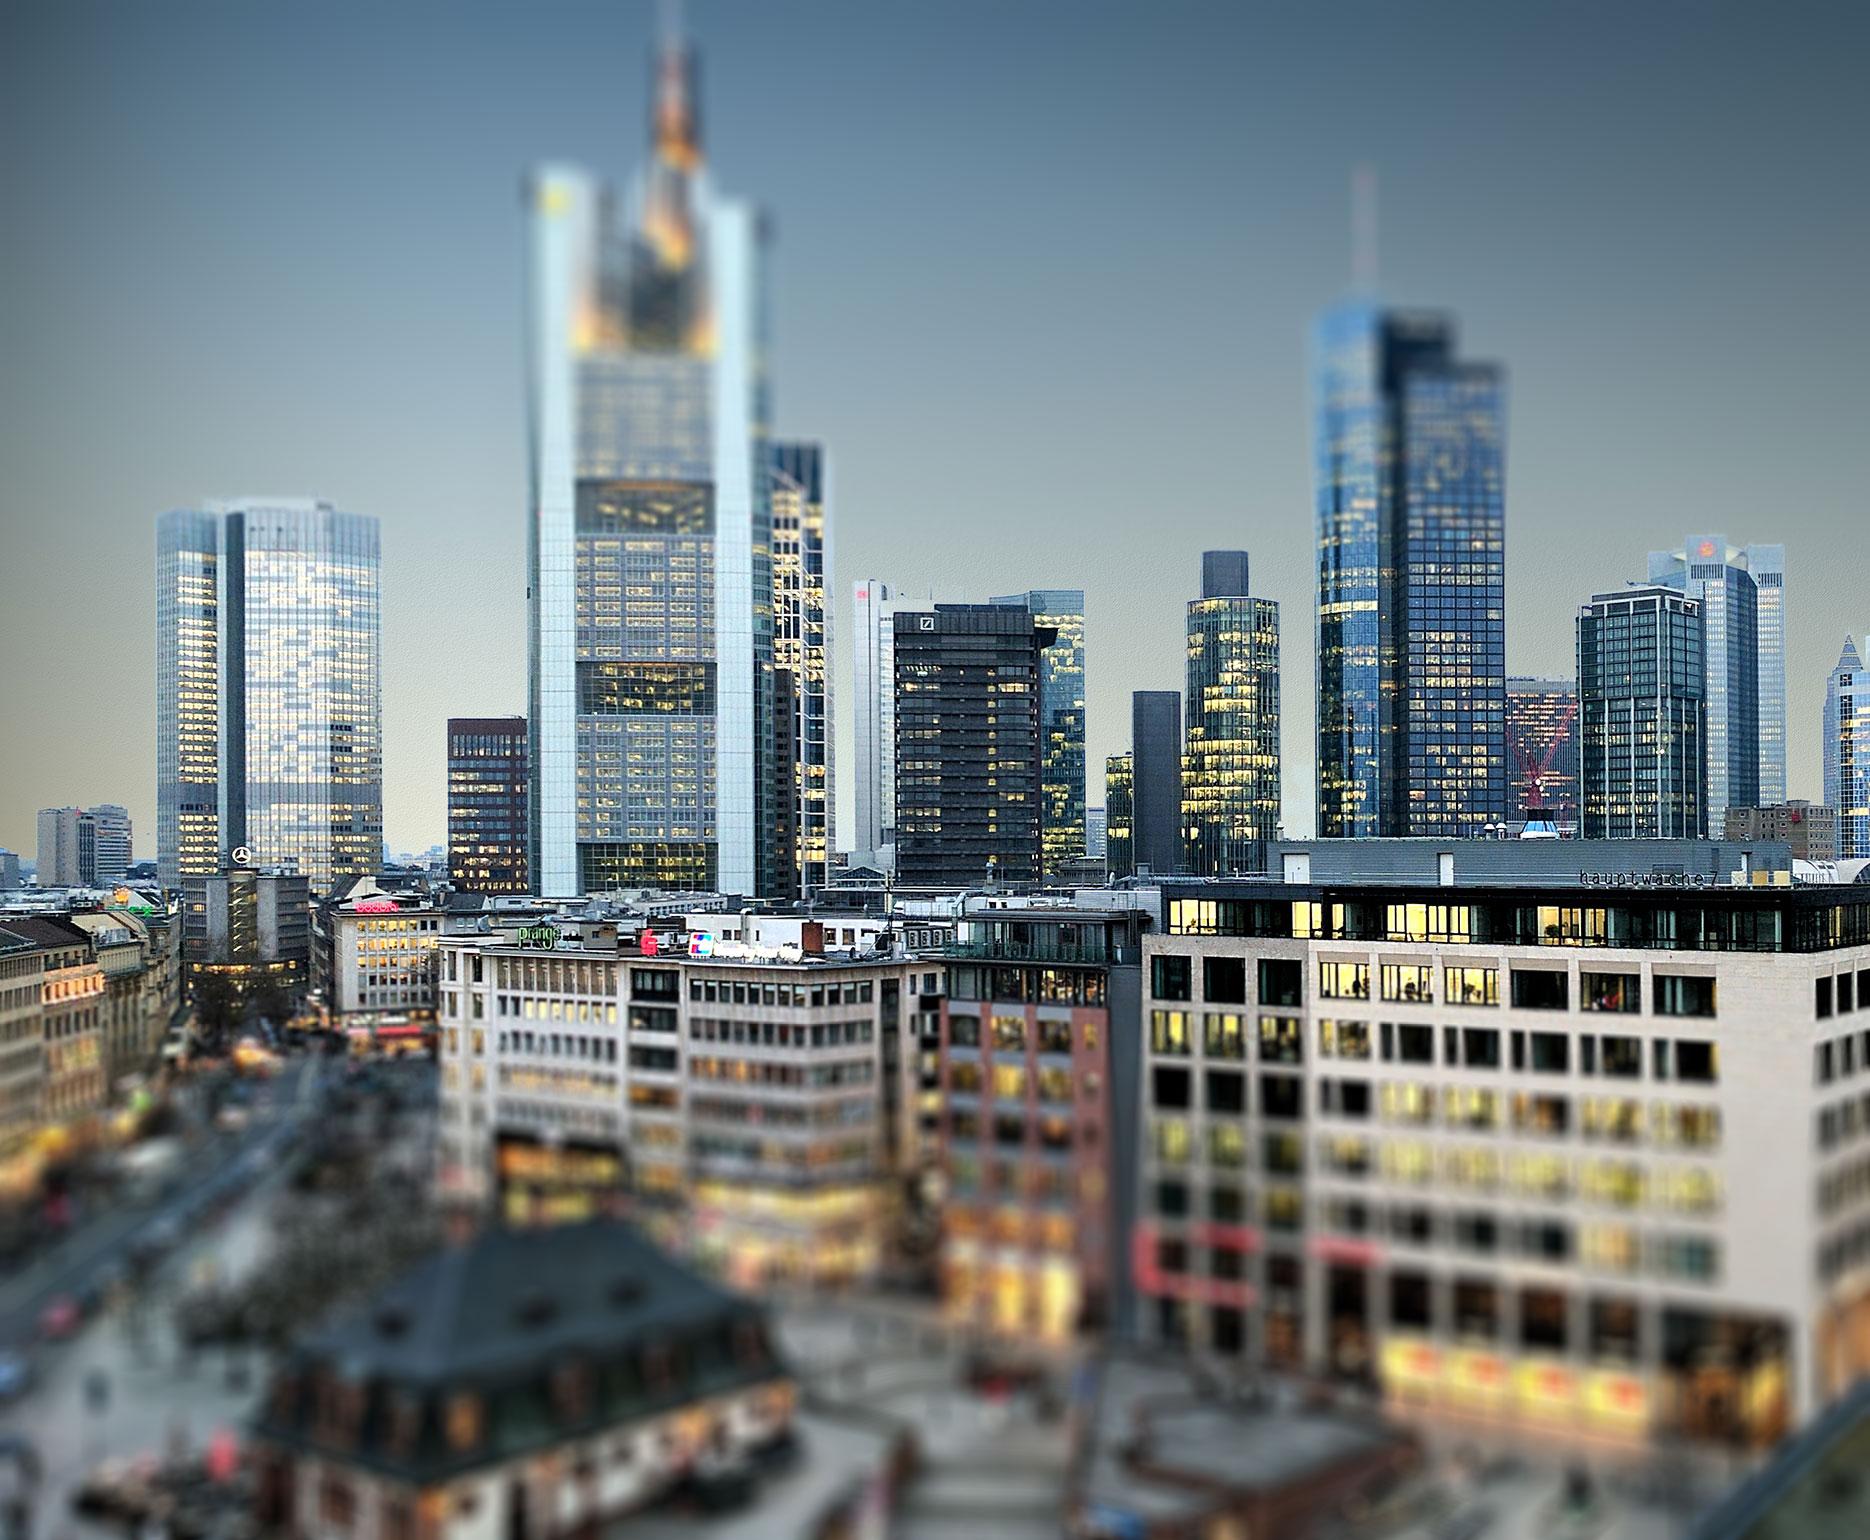 Skyline Frankfurt Foto: Photo by Christian Salow on Unsplash